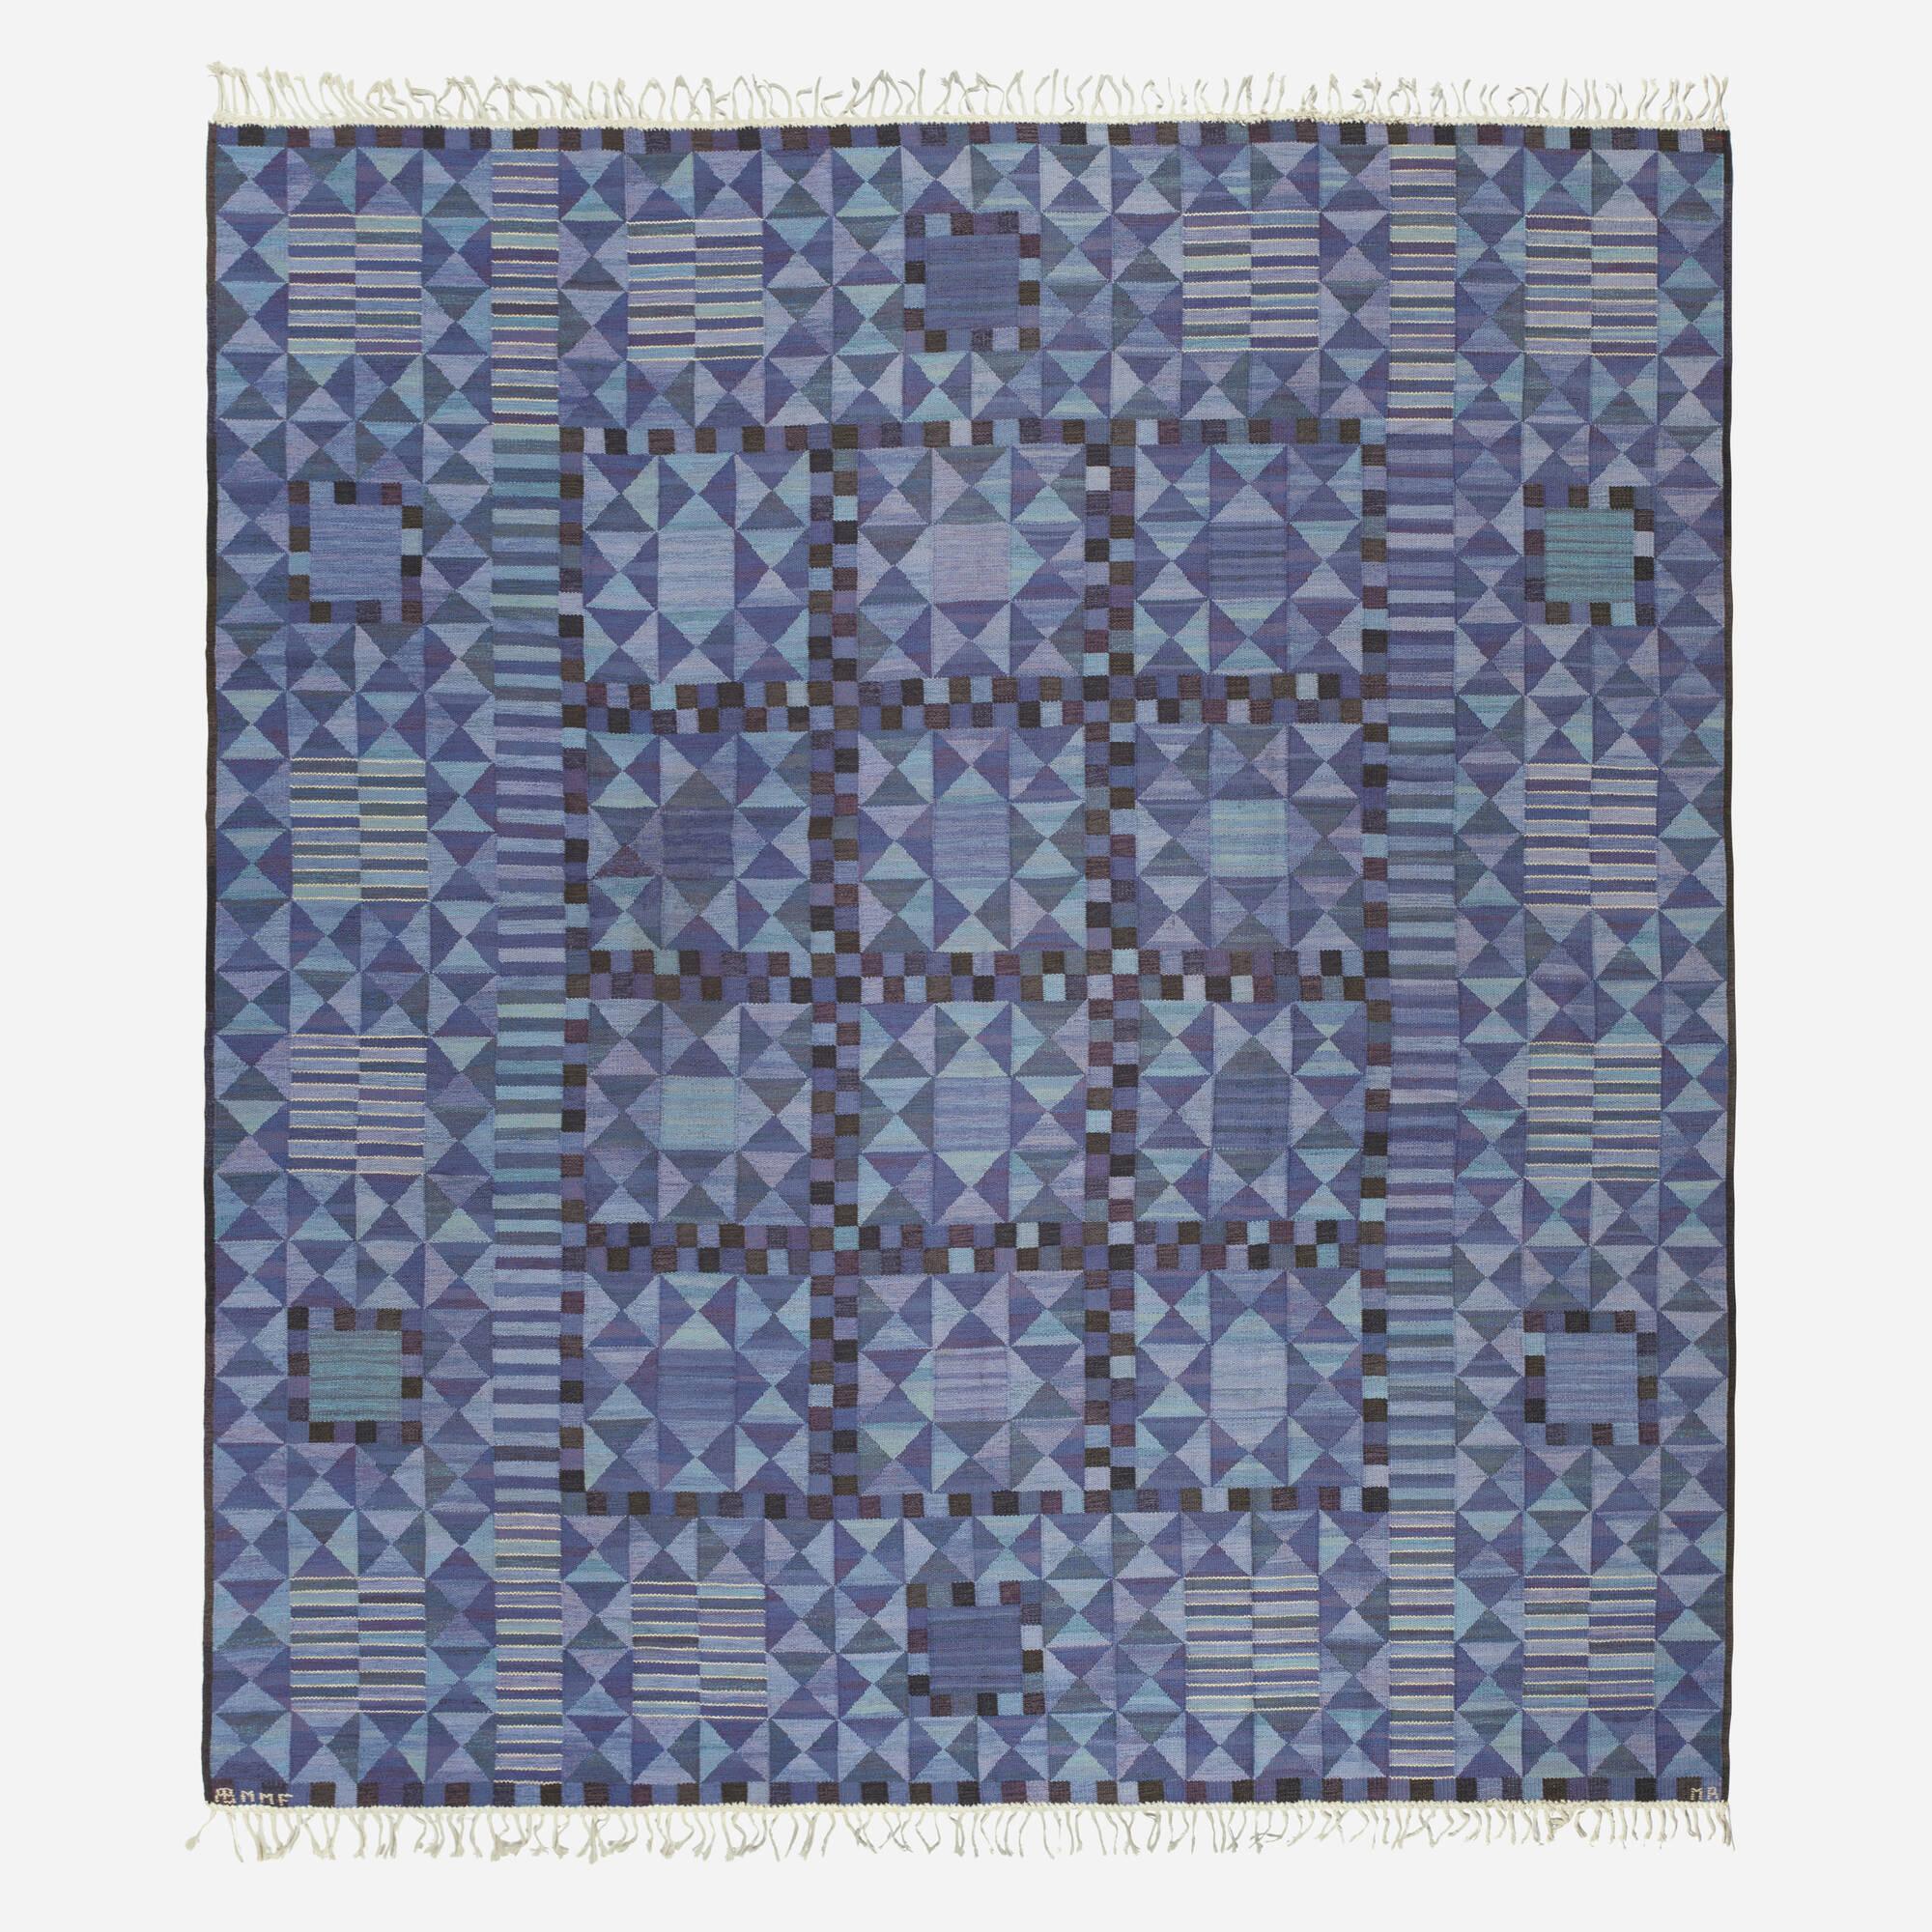 130: Marianne Richter / Rubirosa flatweave carpet (1 of 3)